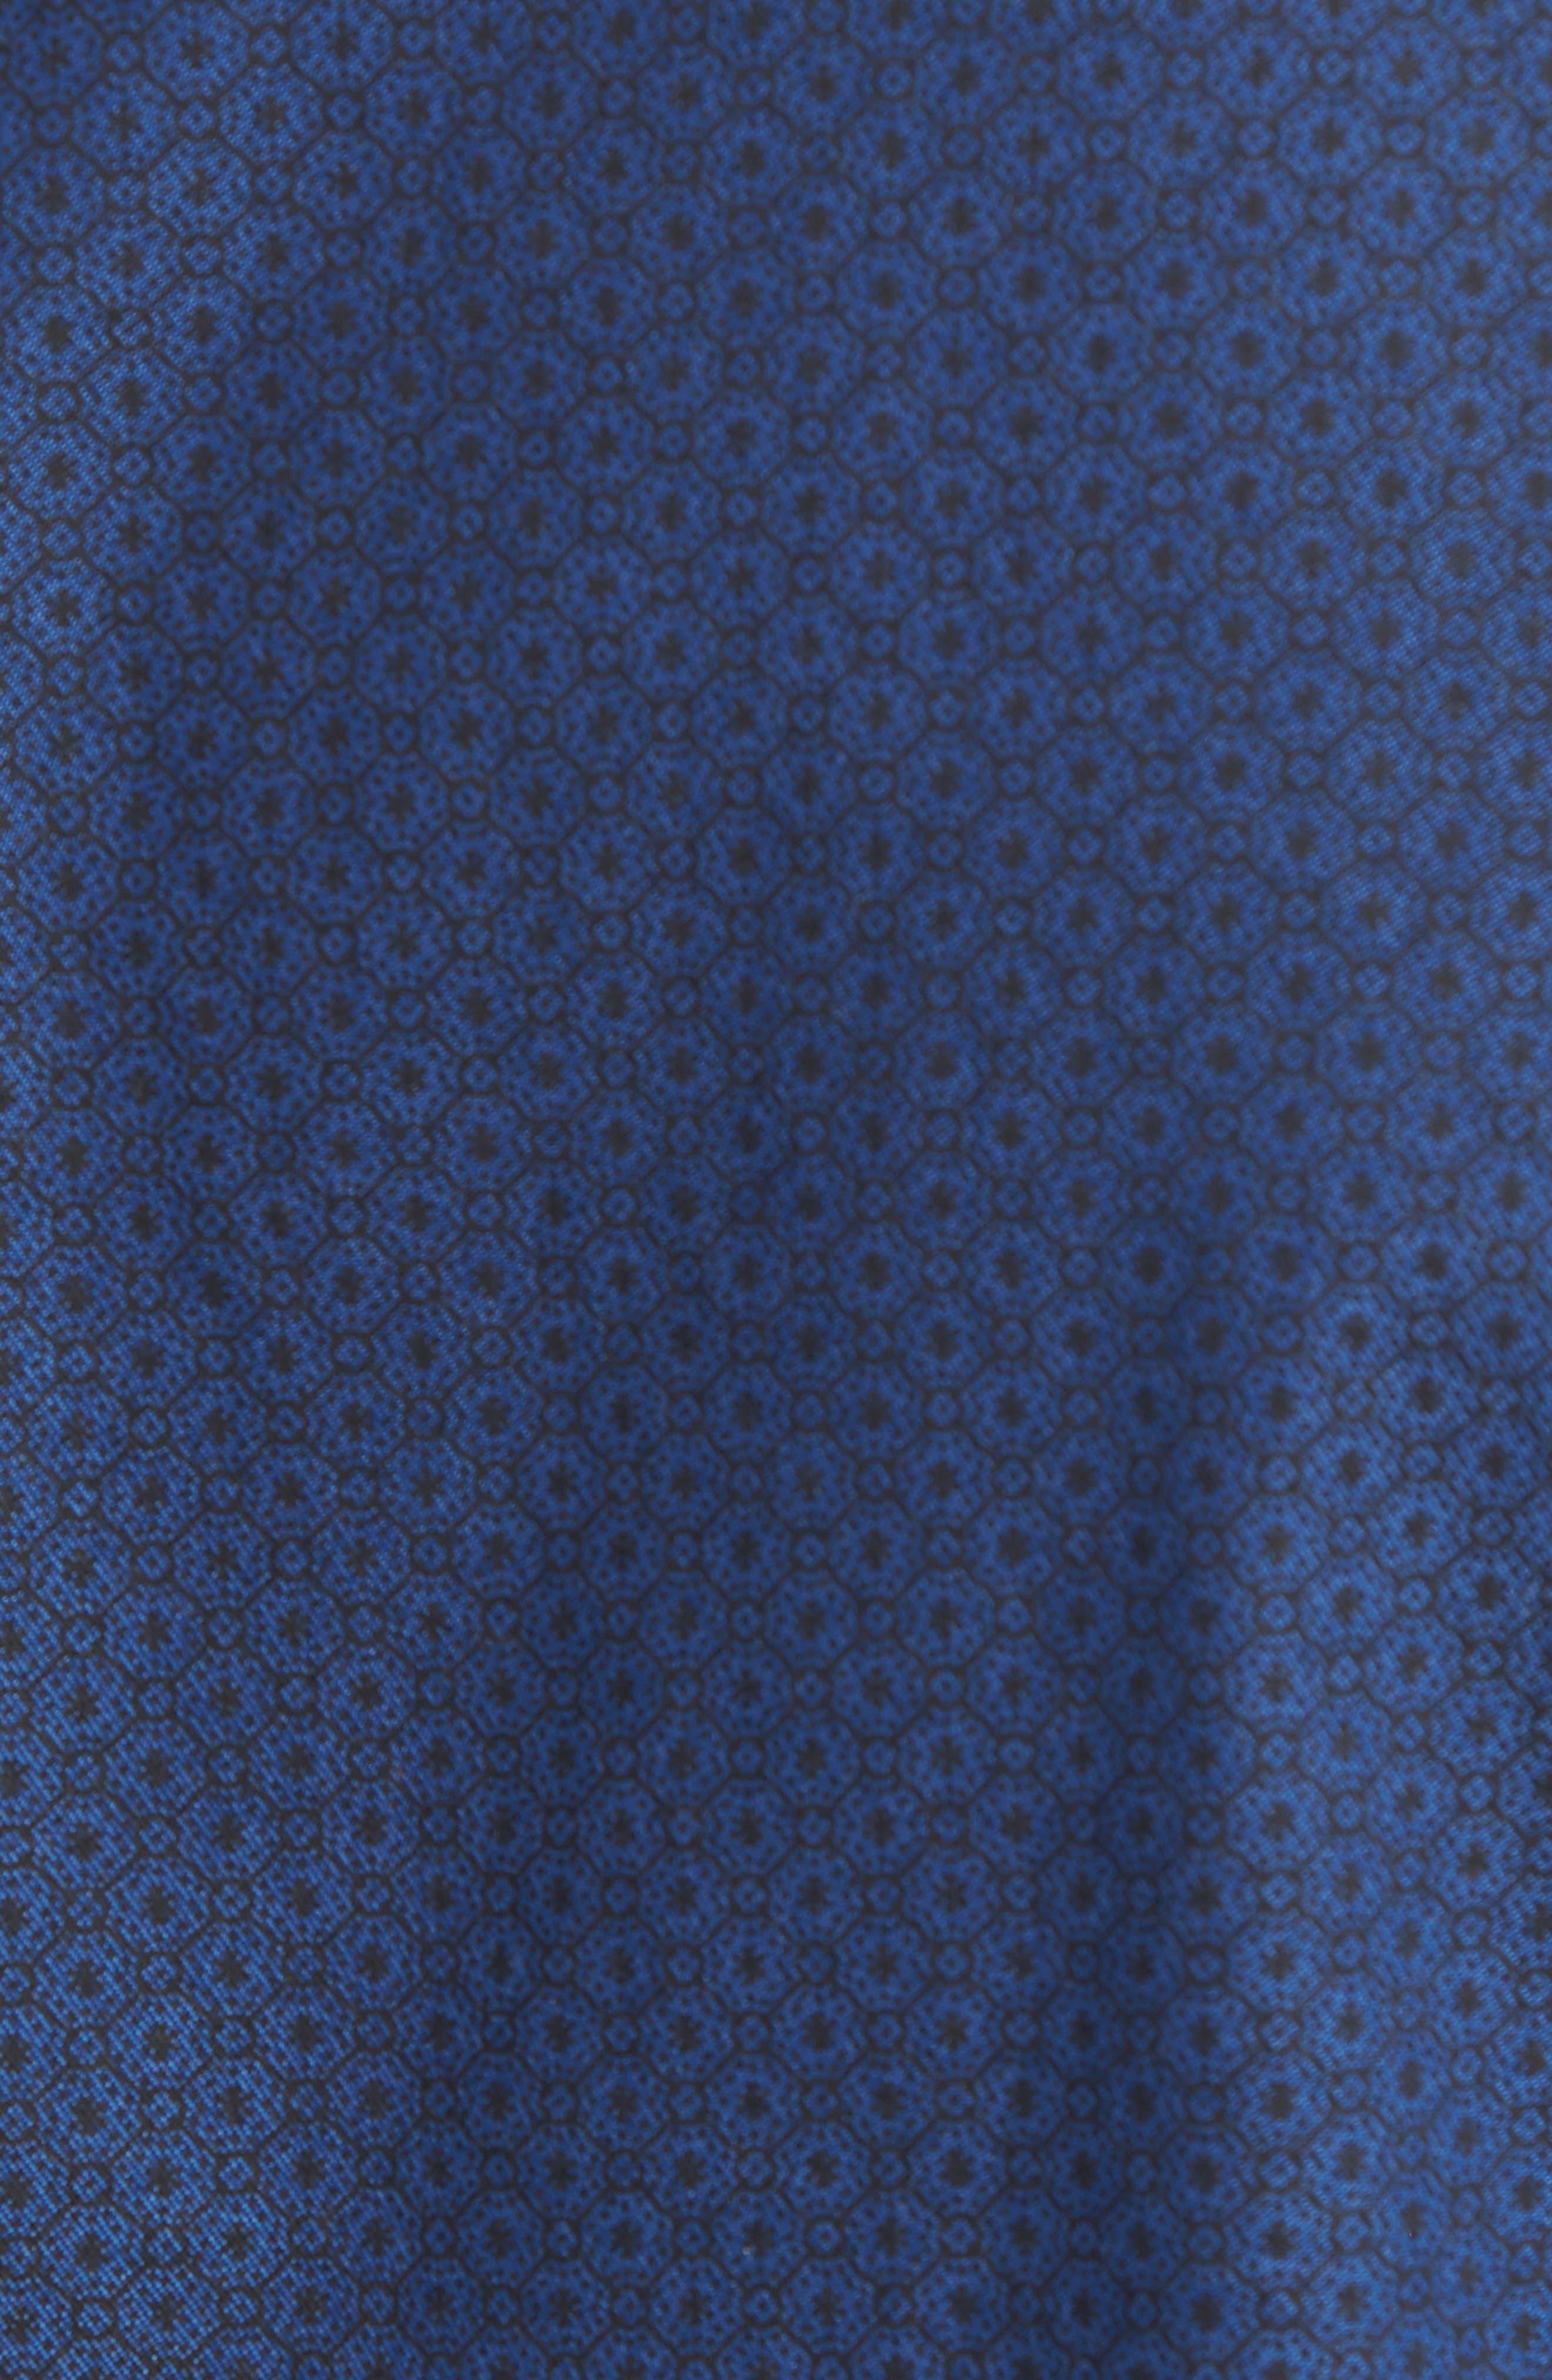 Trim Fit Round Pocket Sport Shirt,                             Alternate thumbnail 5, color,                             Blue Black Flower Print